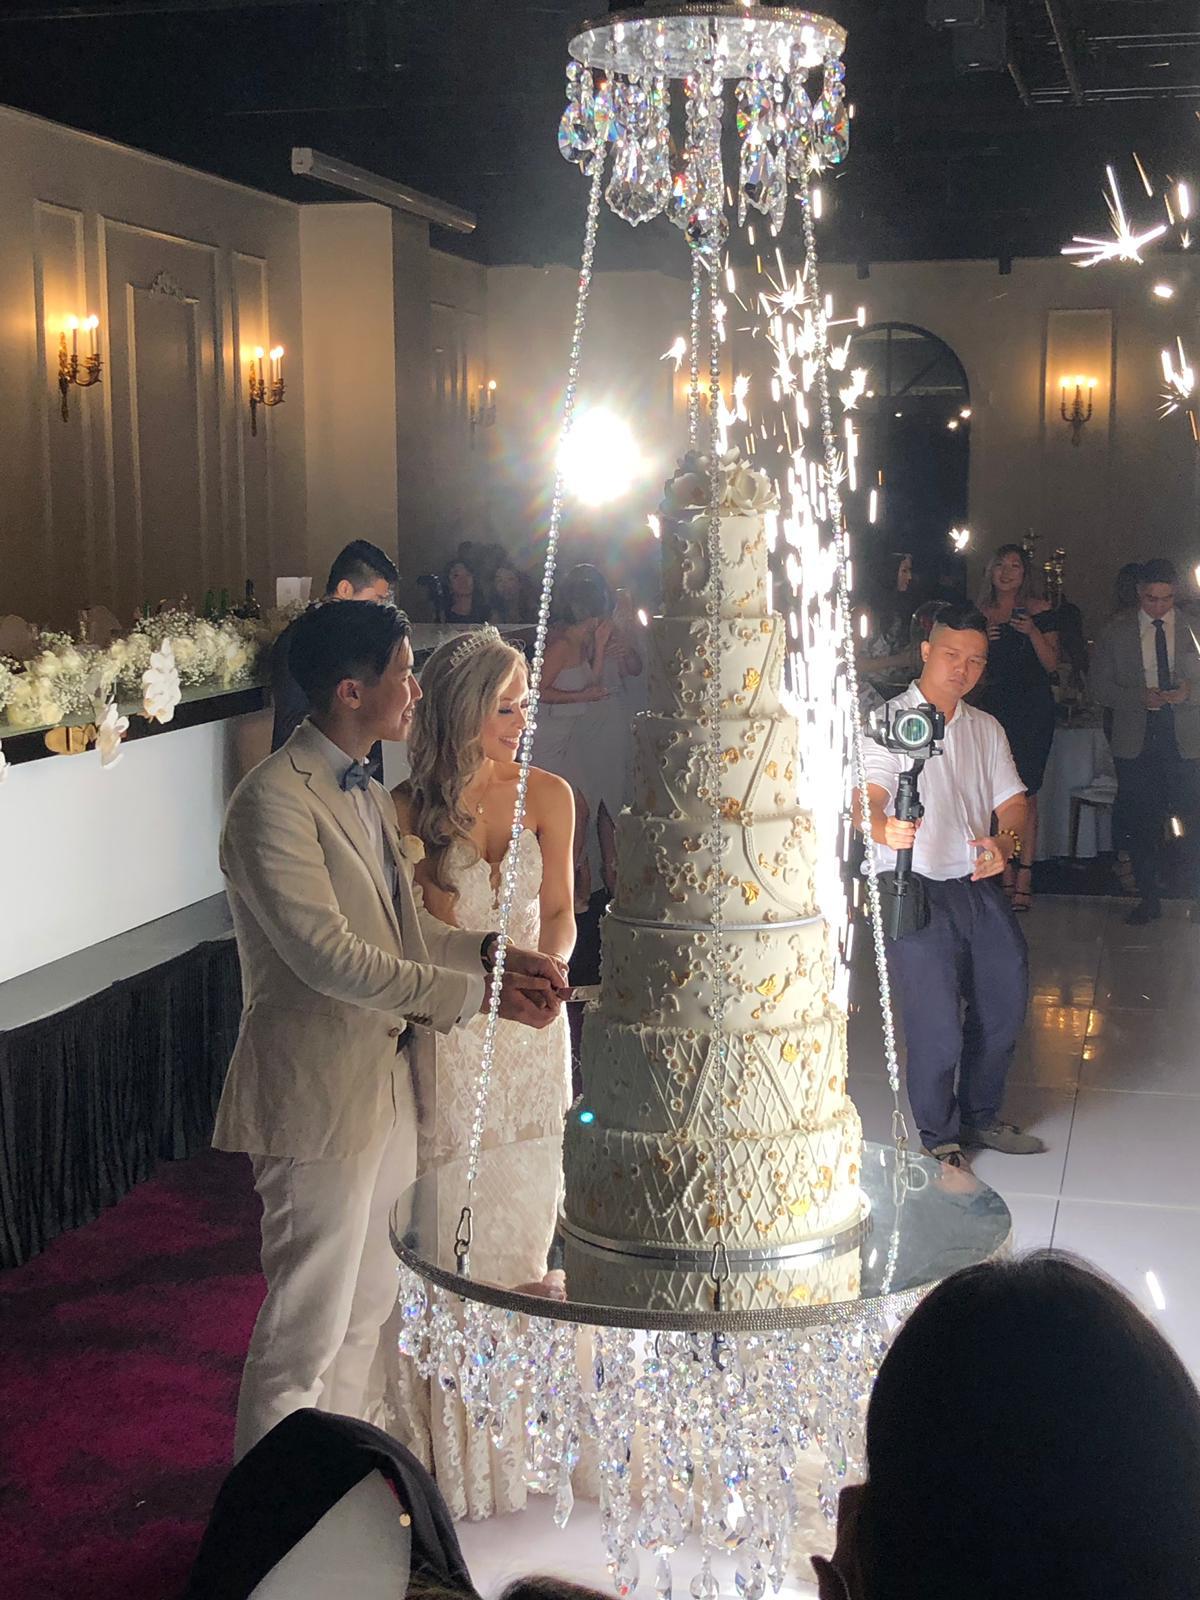 most wonderful cake-cutting moment